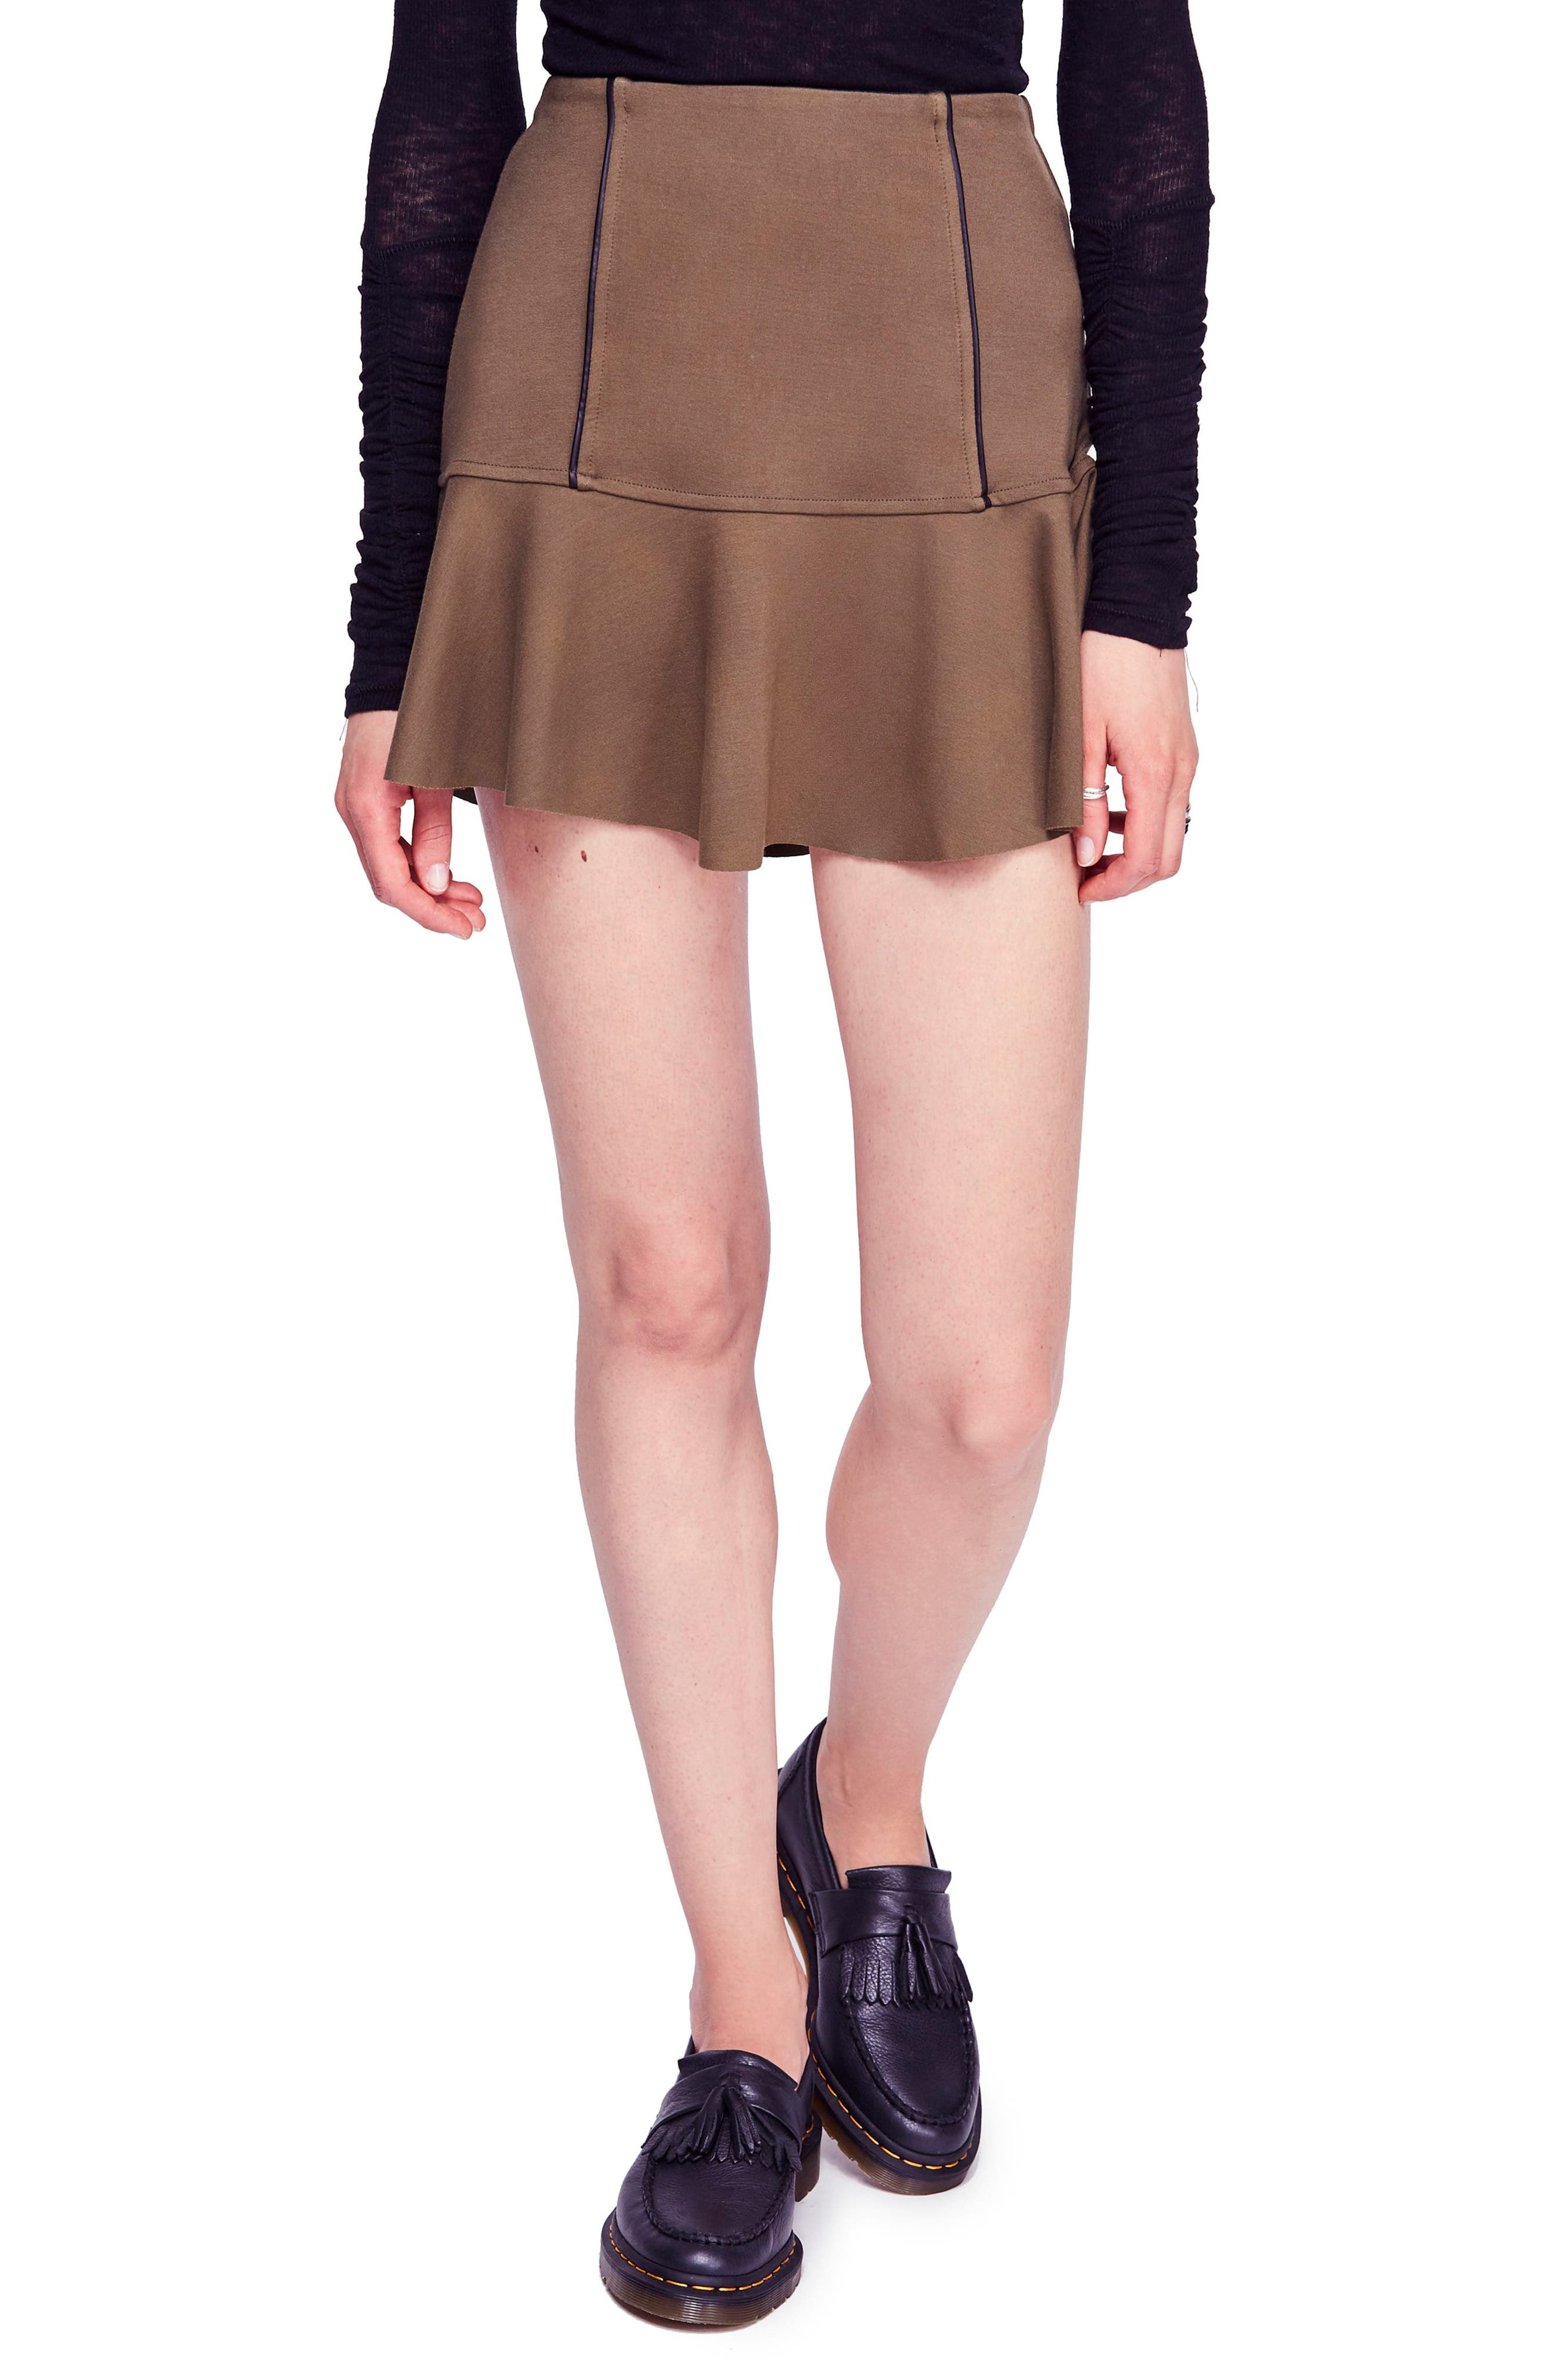 Free People Highlands Miniskirt, Brown